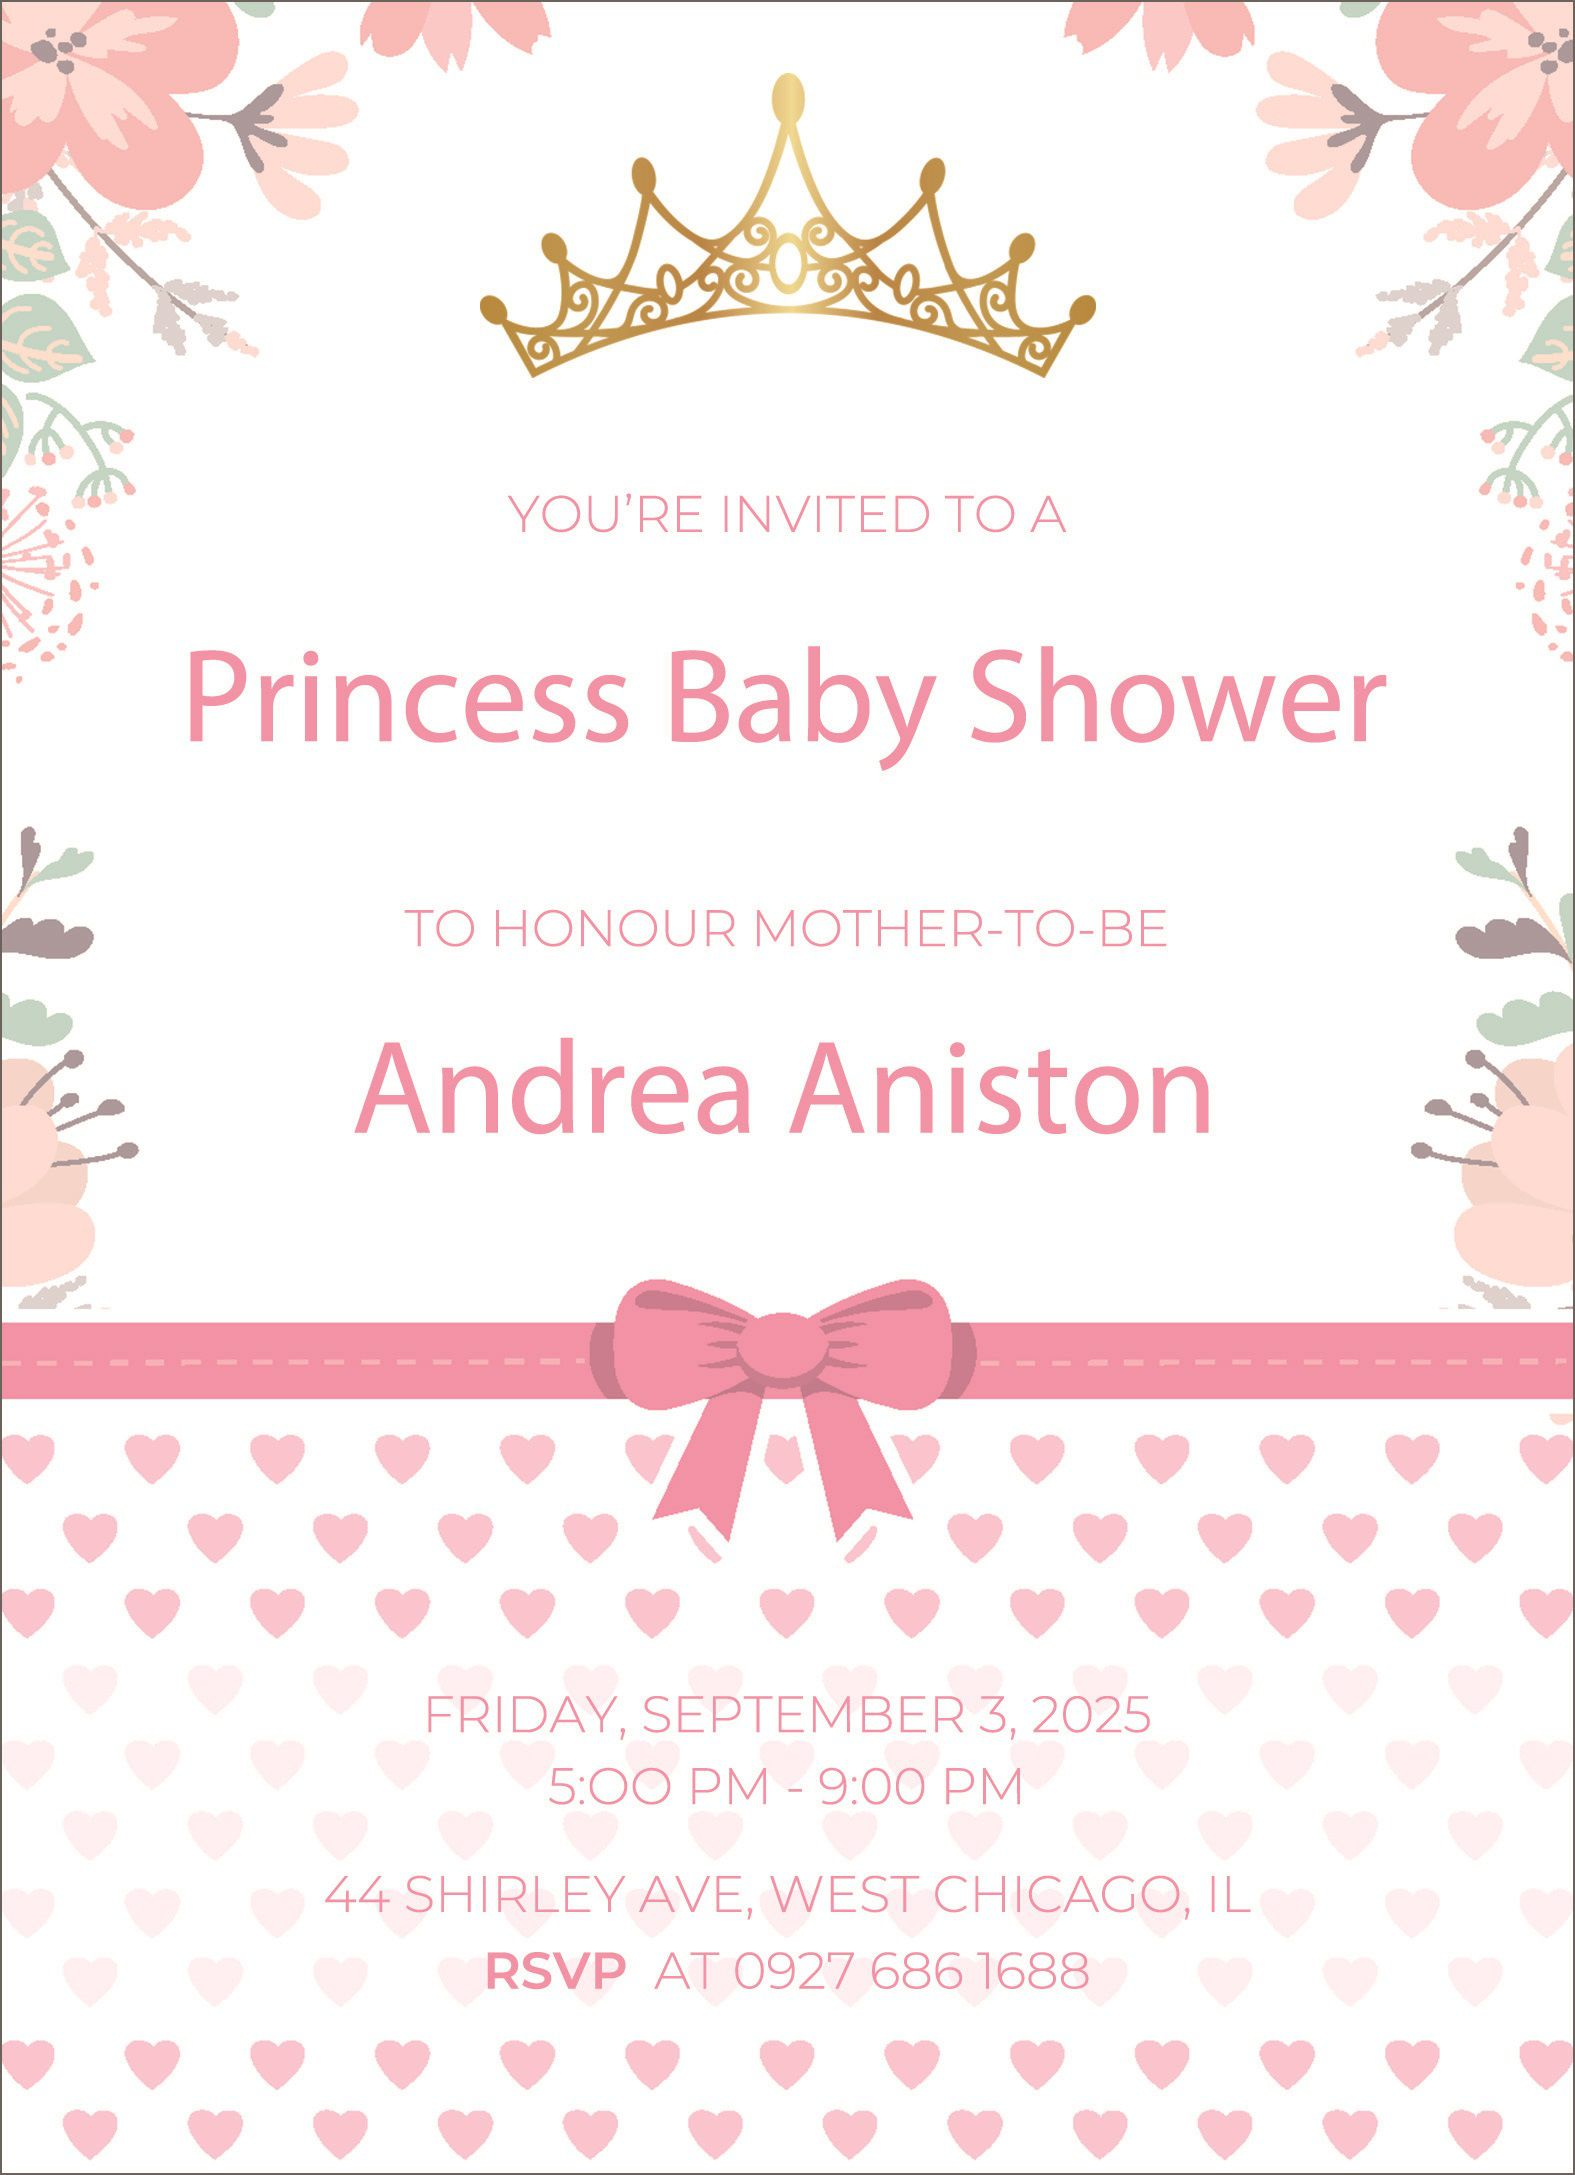 005 Shocking Microsoft Word Invitation Template Baby Shower Example  Free Editable InviteFull